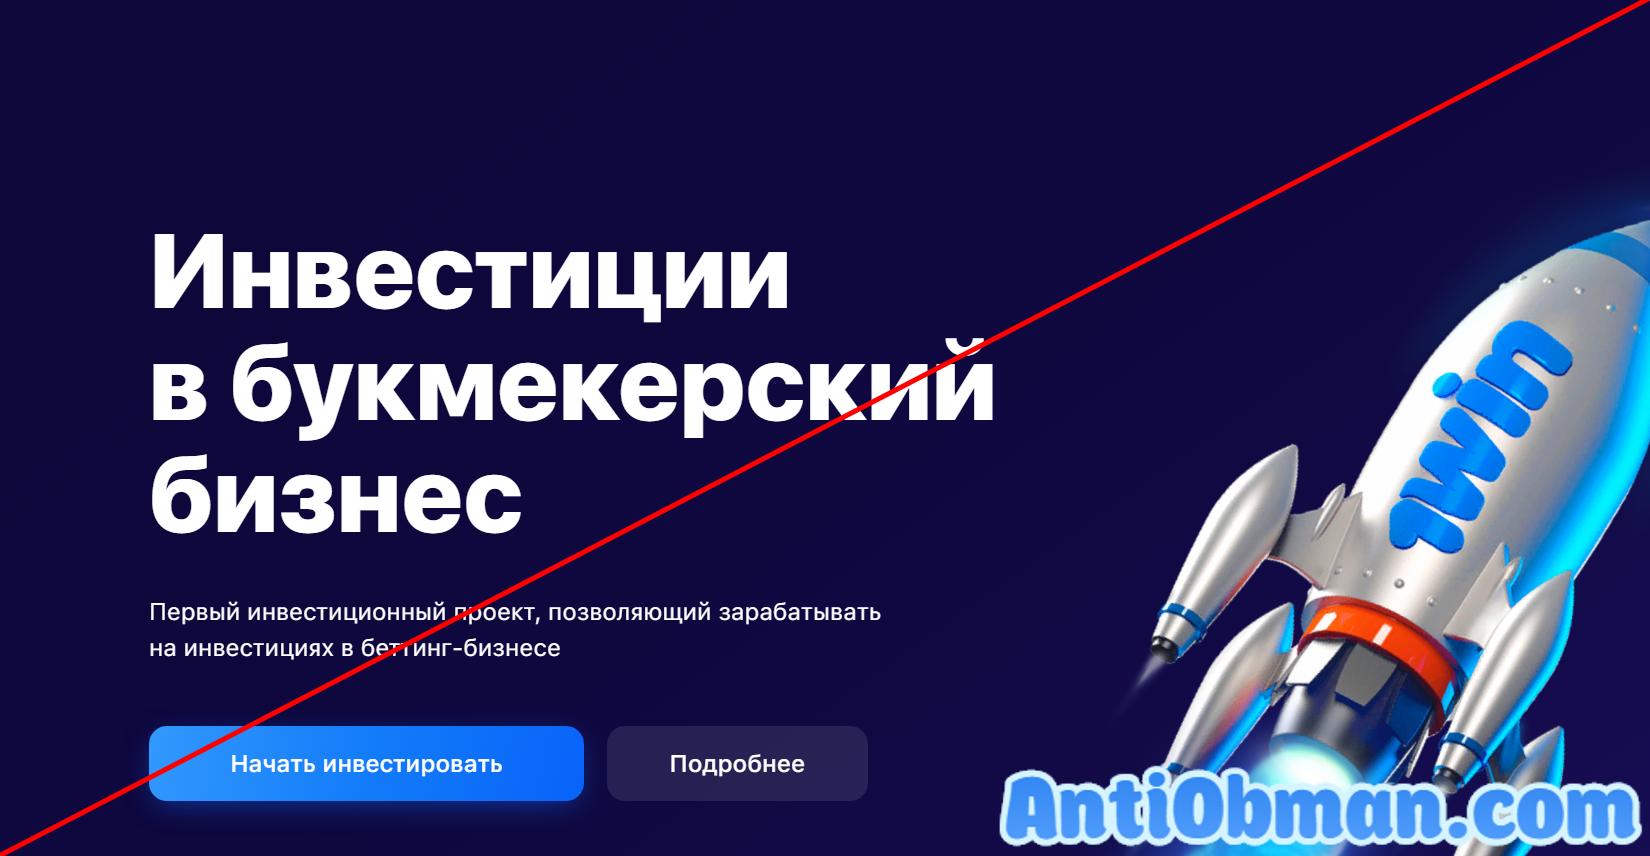 1win invest (1win-invest.ru)